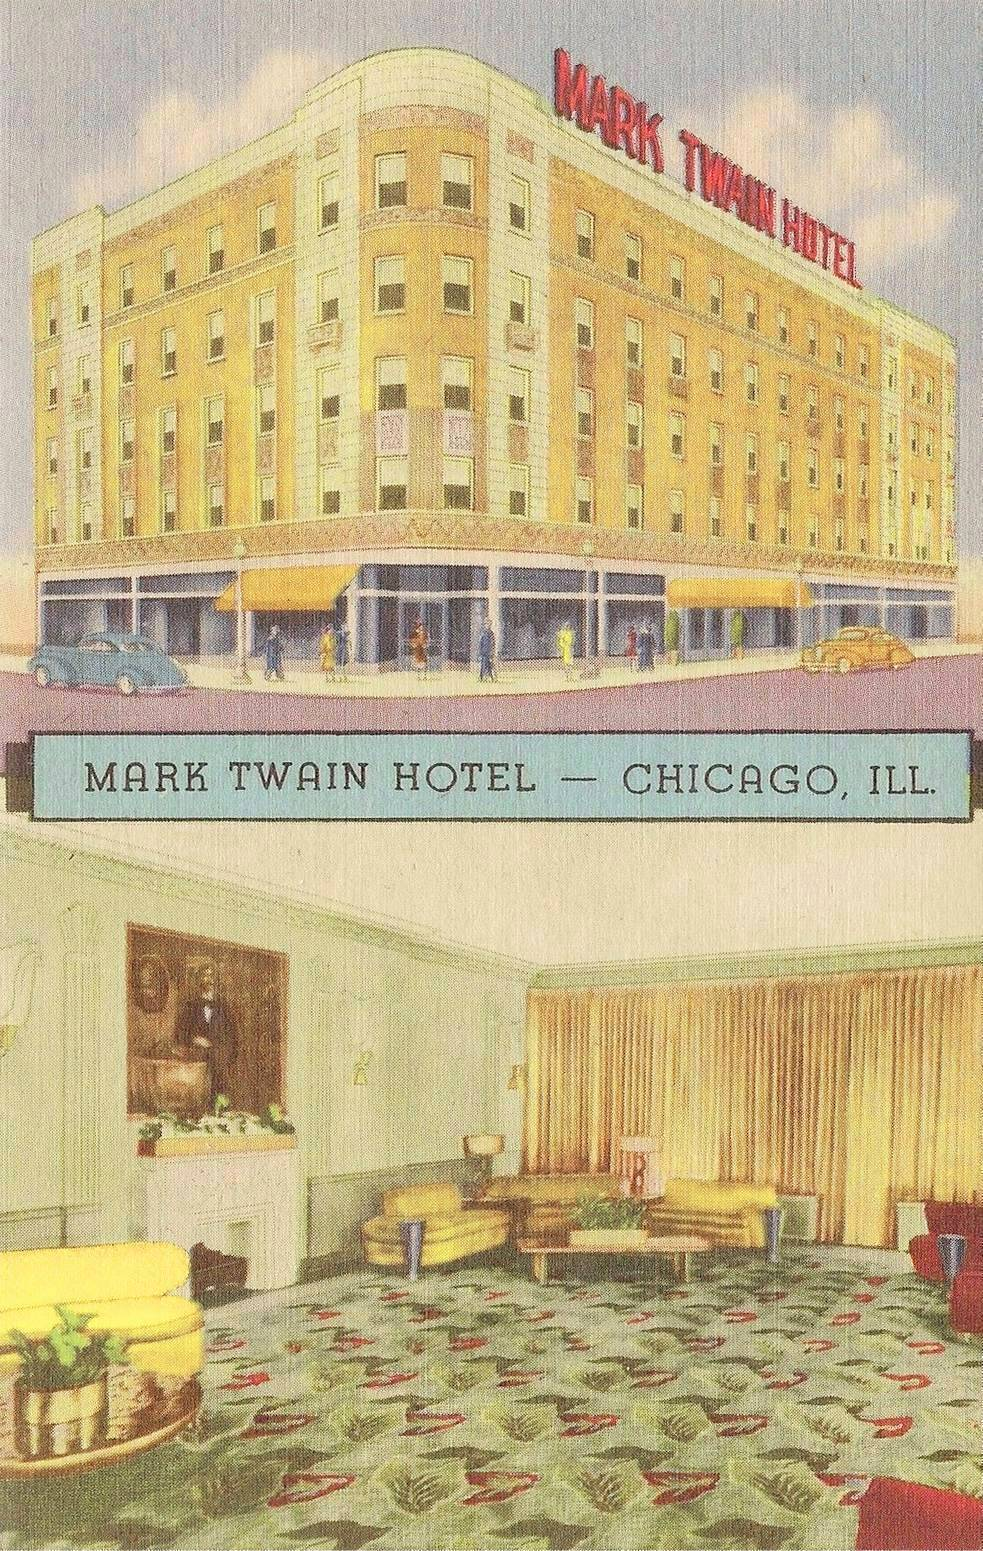 POSTCARD - CHICAGO - MARK TWAIN HOTEL - 111 W DIVISION - AT CLARK - SUBWAY STATION AT ENTRANCE - NEAR LINCOLN PARK - 200 ROOMS - c1950